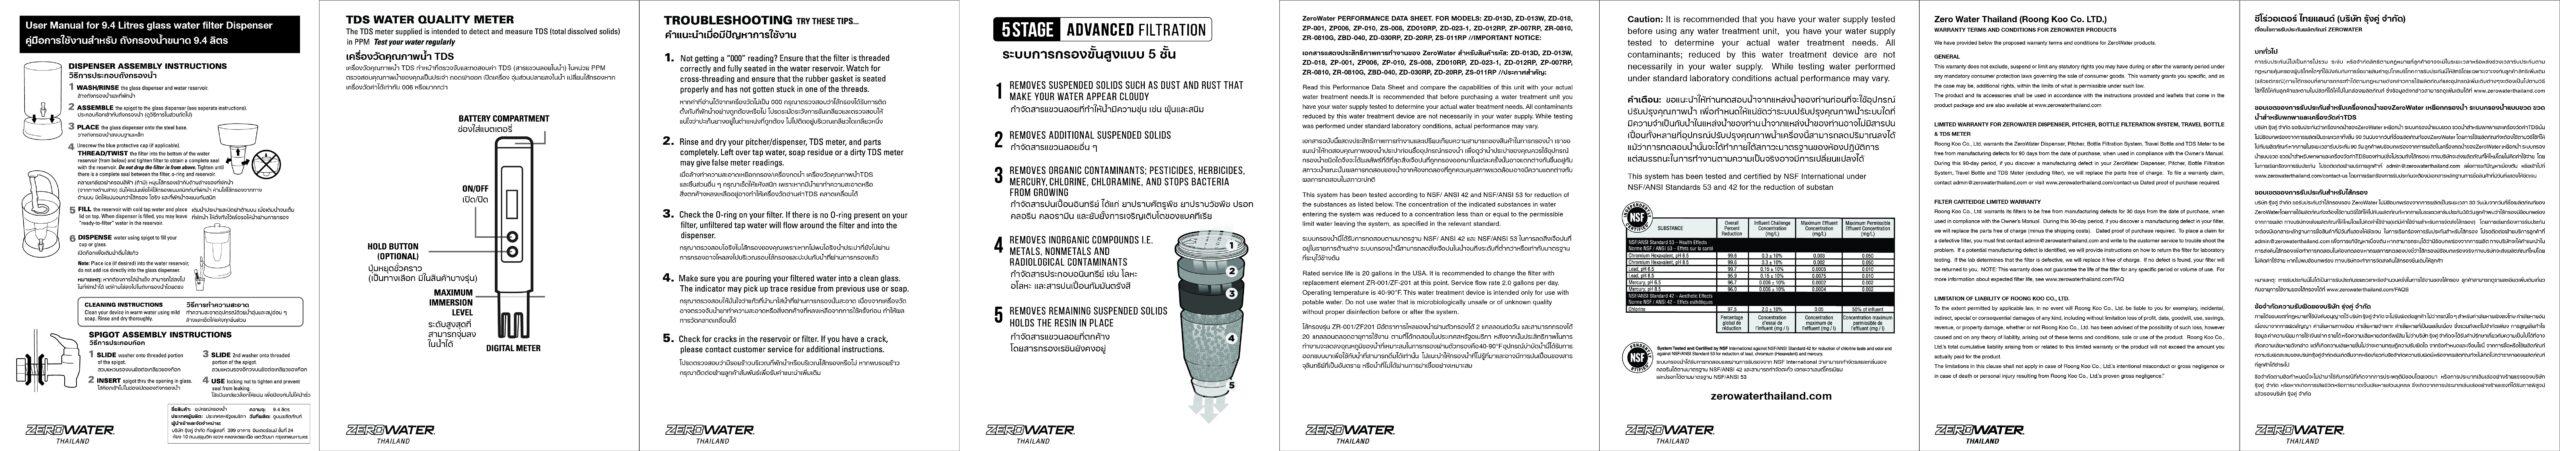 Faqs Zero Water Thailand